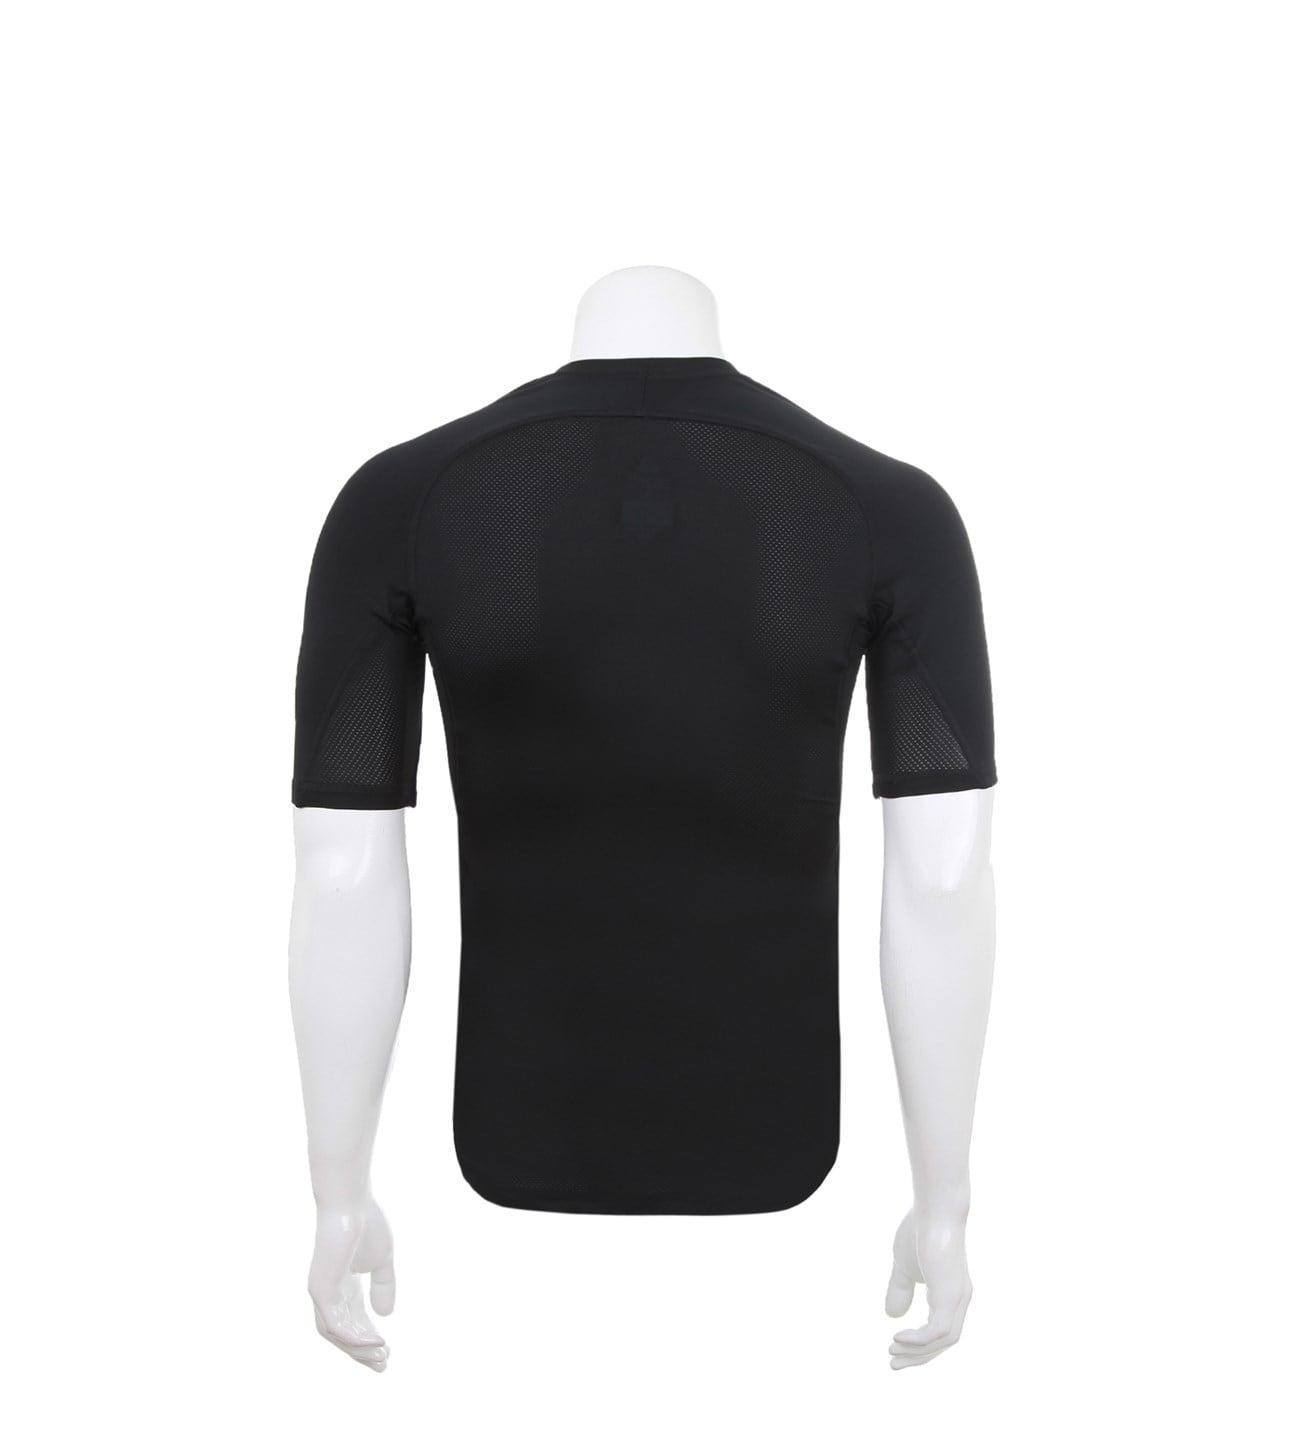 Spr Erkek Cf7235 Adidas Pro Ask E Tee Ss Siyah İçlik CdWQxBero